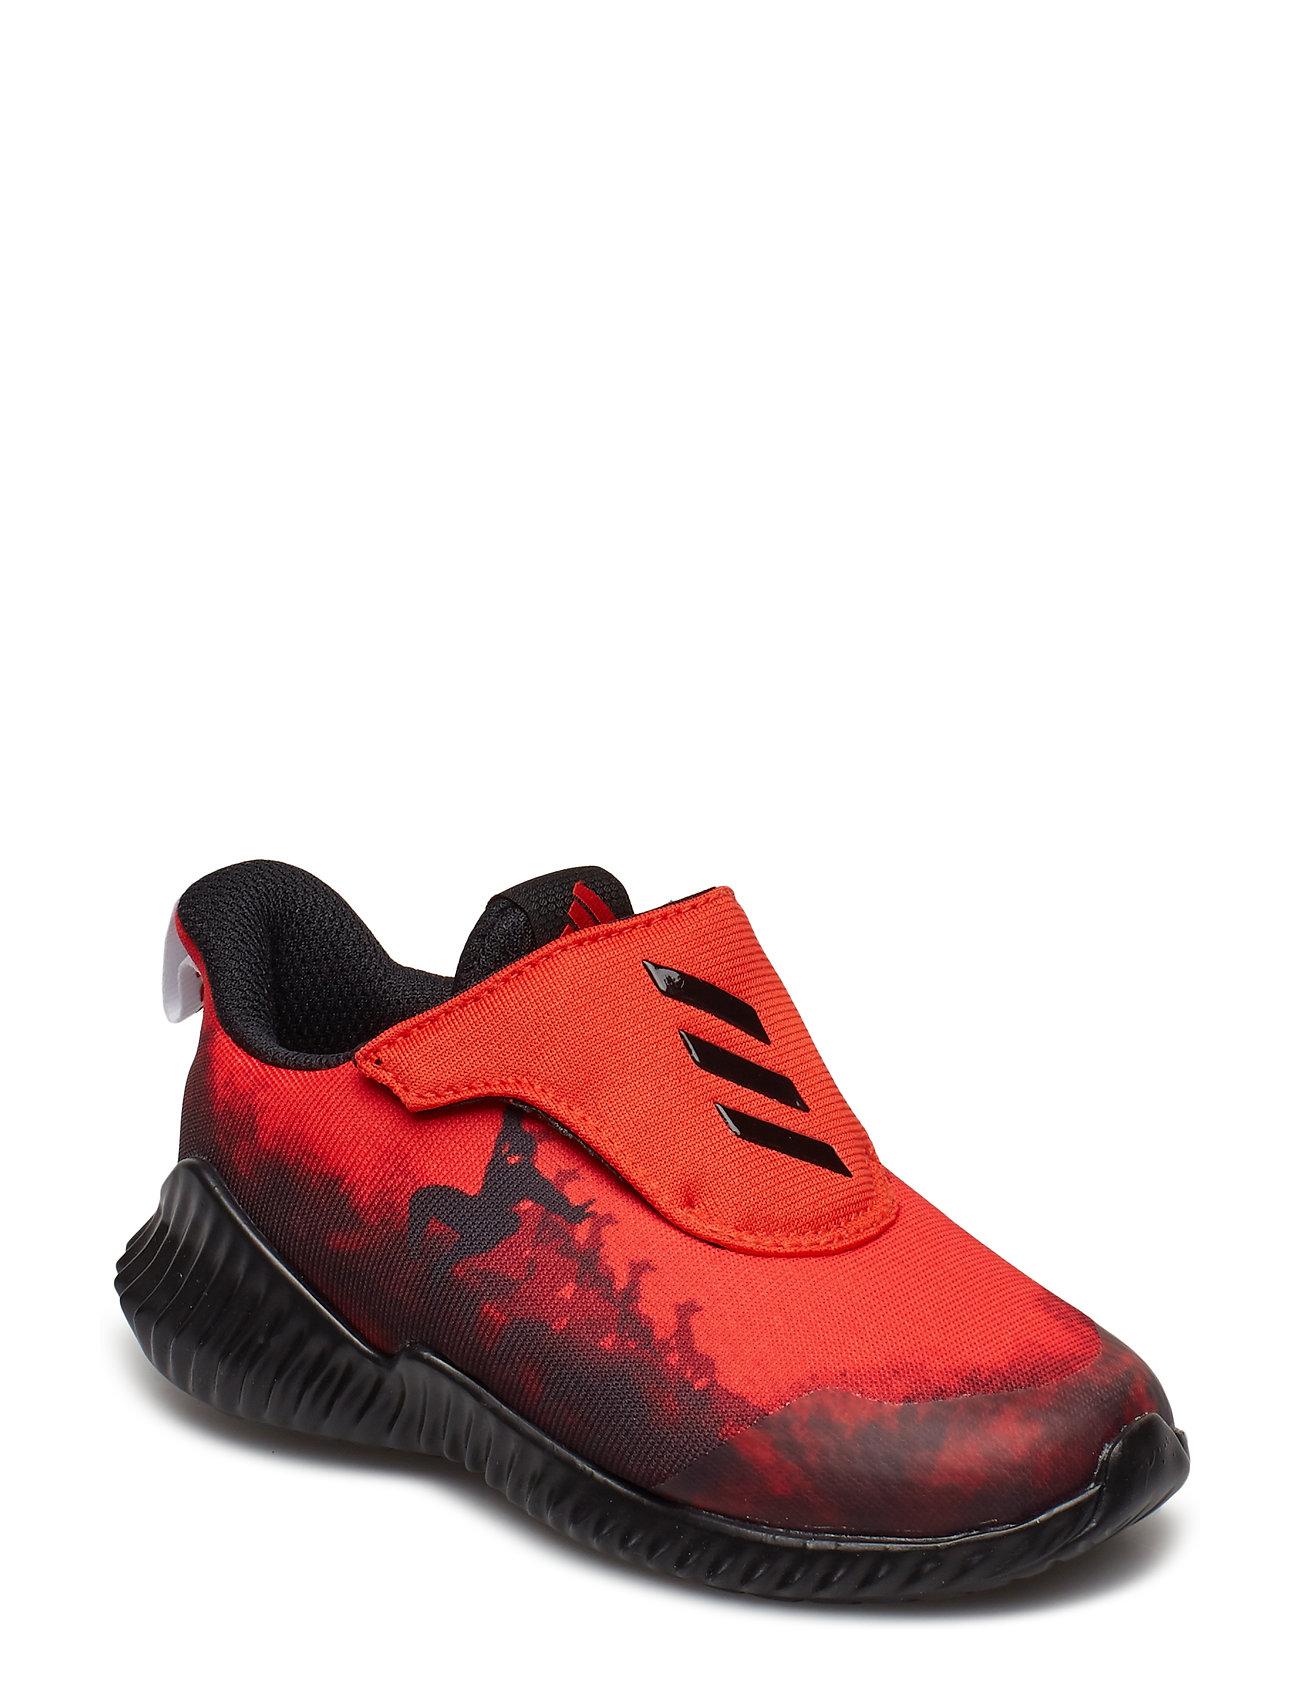 4e43cea5 Fortarun Spider-man Ac I (Actred/cblack/ftwwht) (244.30 kr) - adidas ...